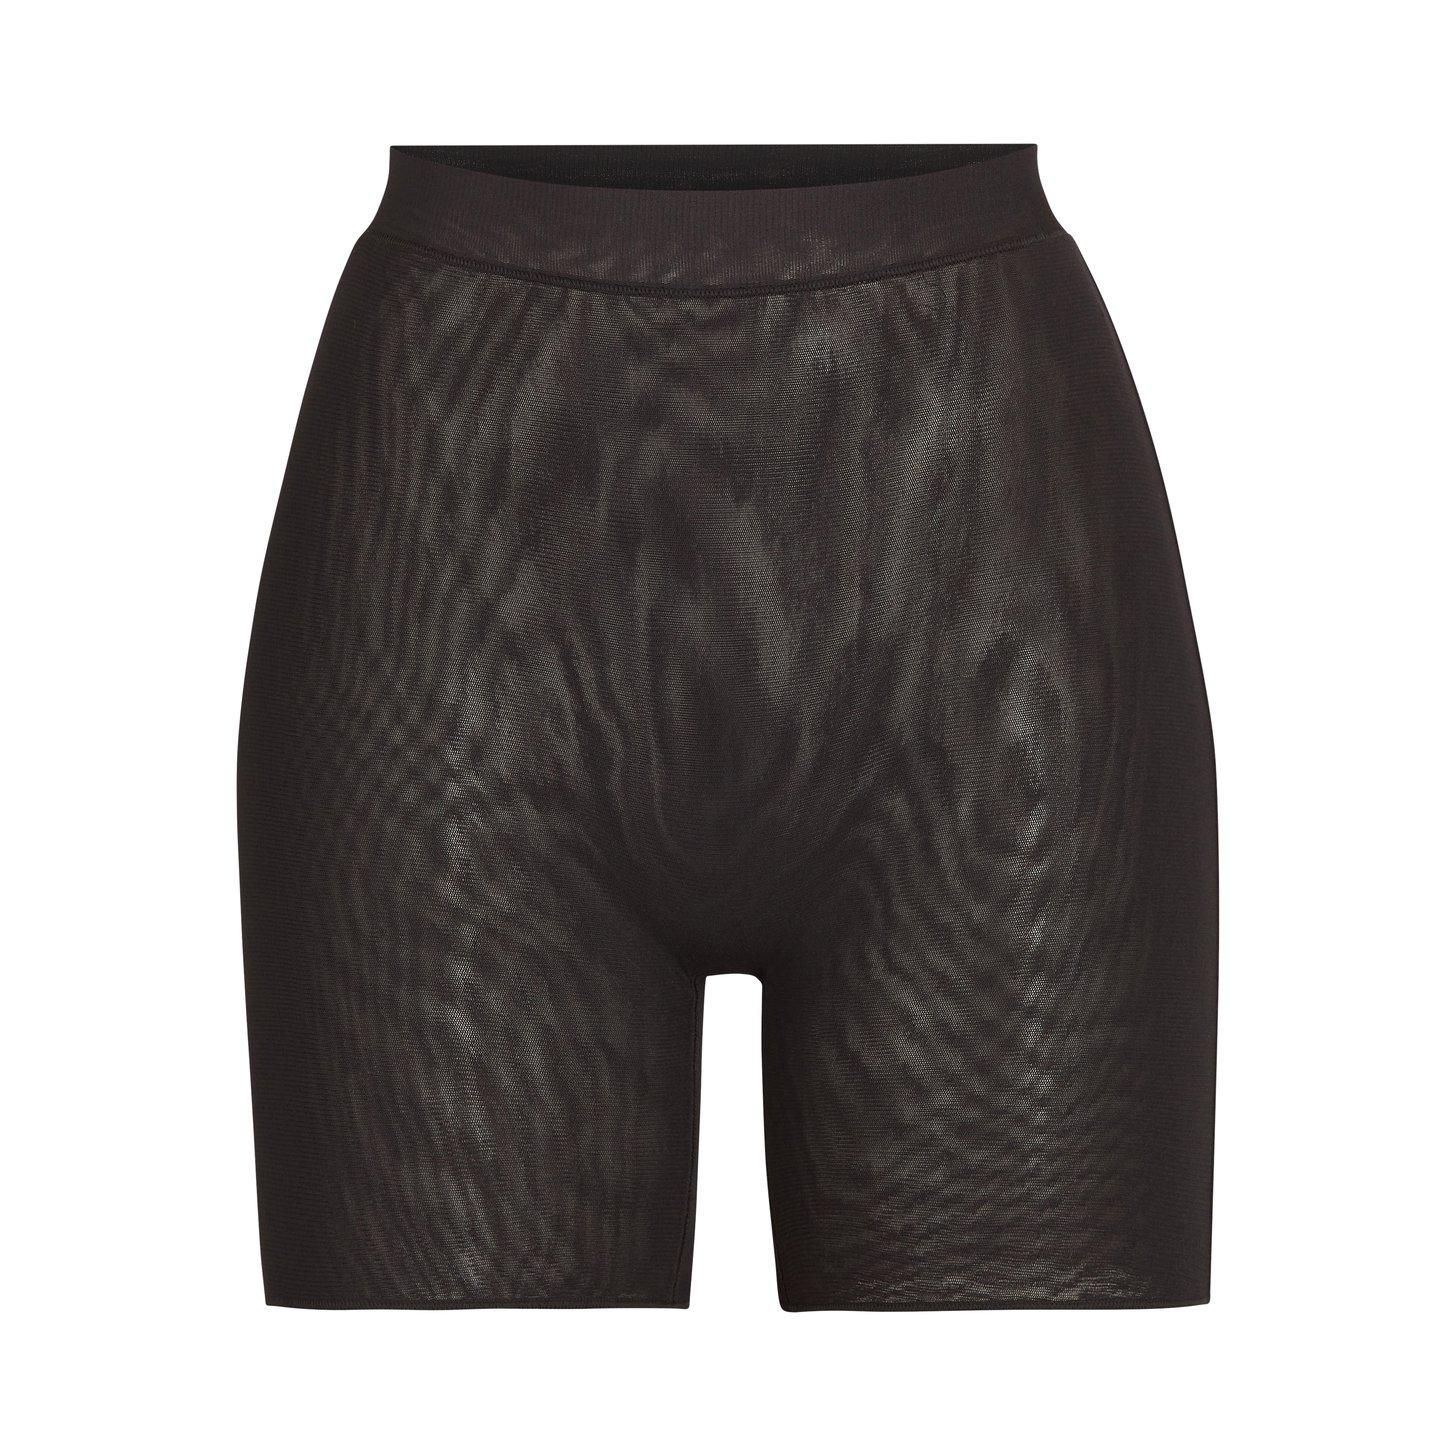 SUMMER MESH SHORT by Skims, available on skims.com for $30 Kim Kardashian Shorts Exact Product